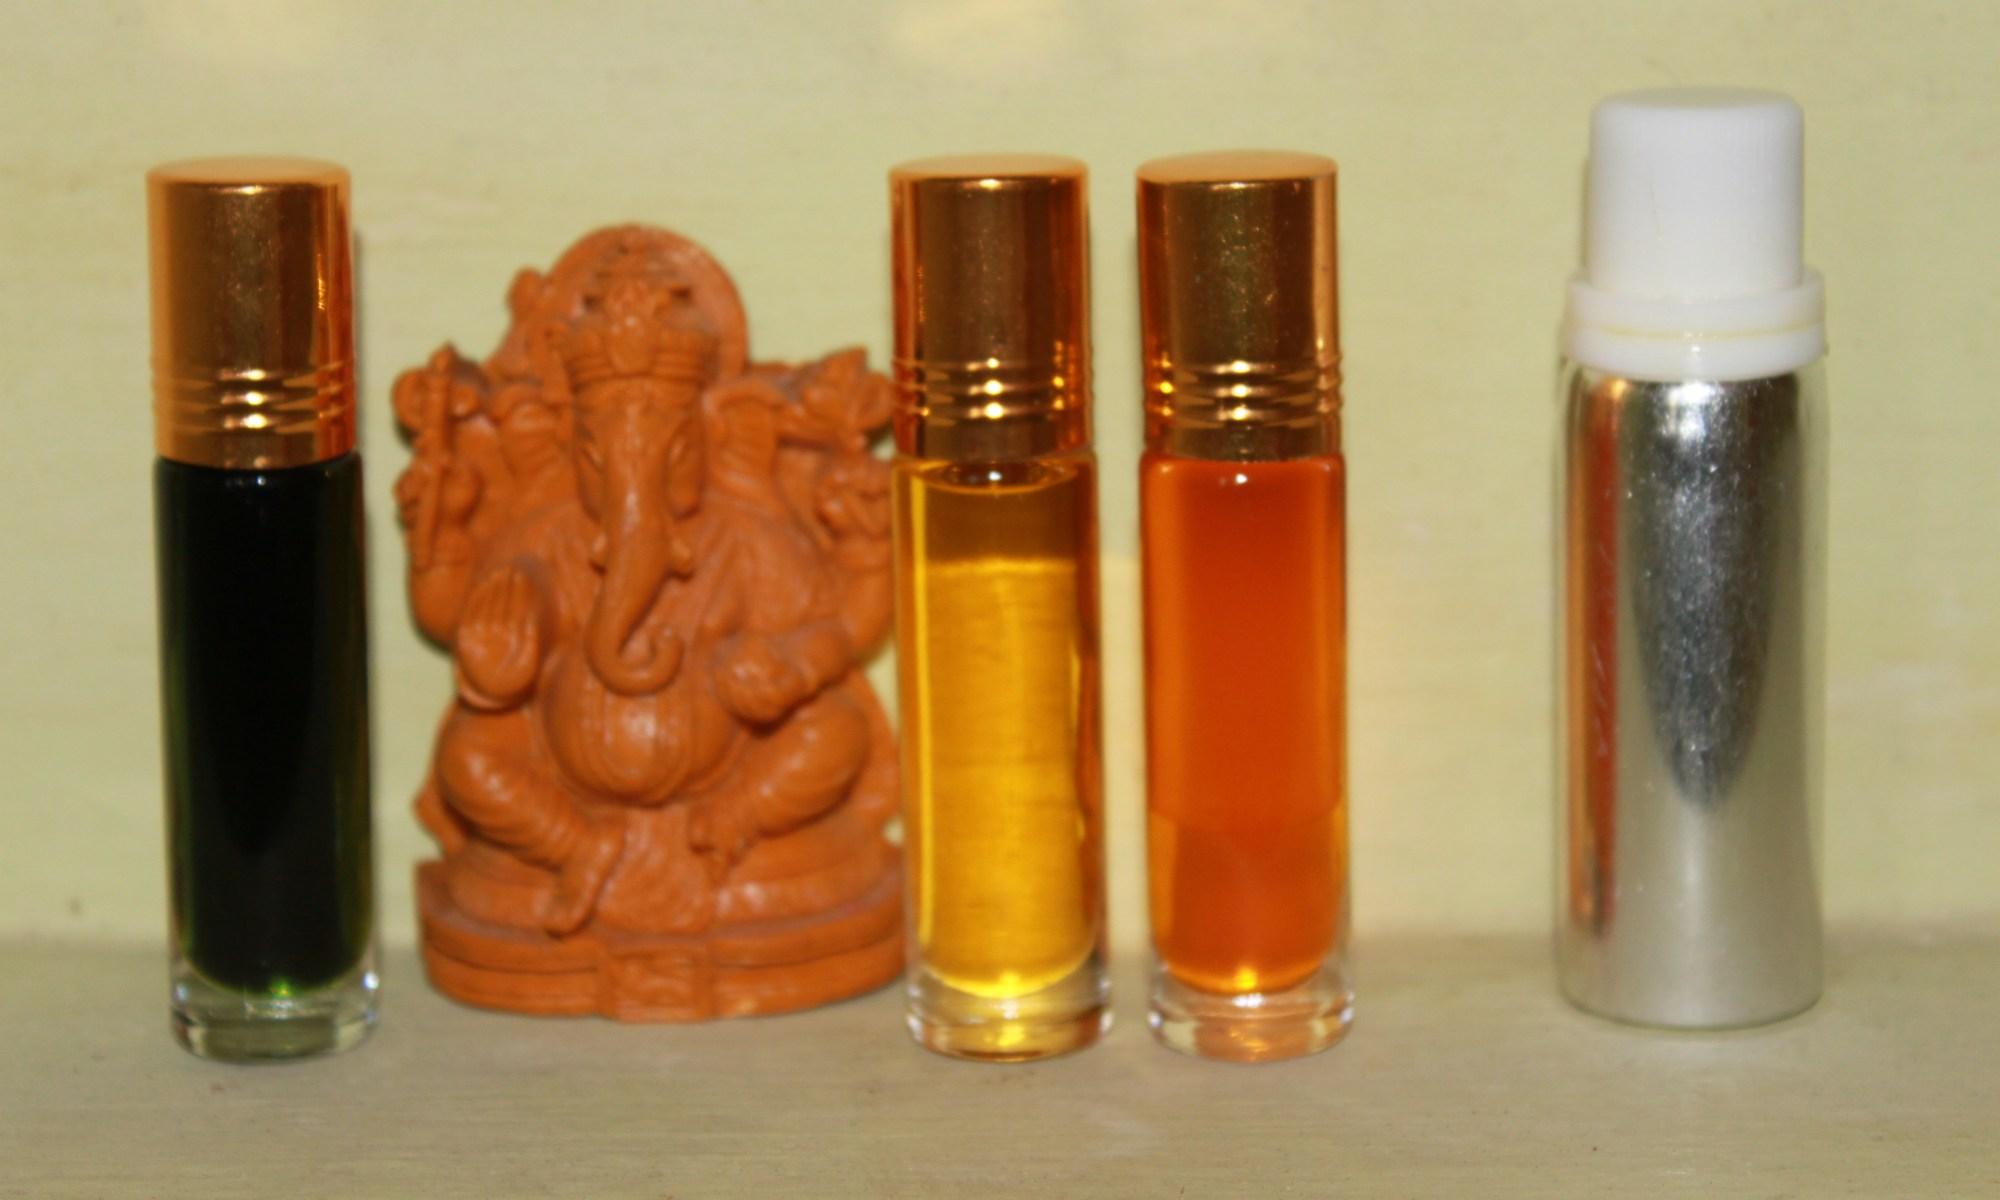 Ayruvedic Oils: from right to left, Lavender, Saffron oil, Sandalwood oil, Lotus oil